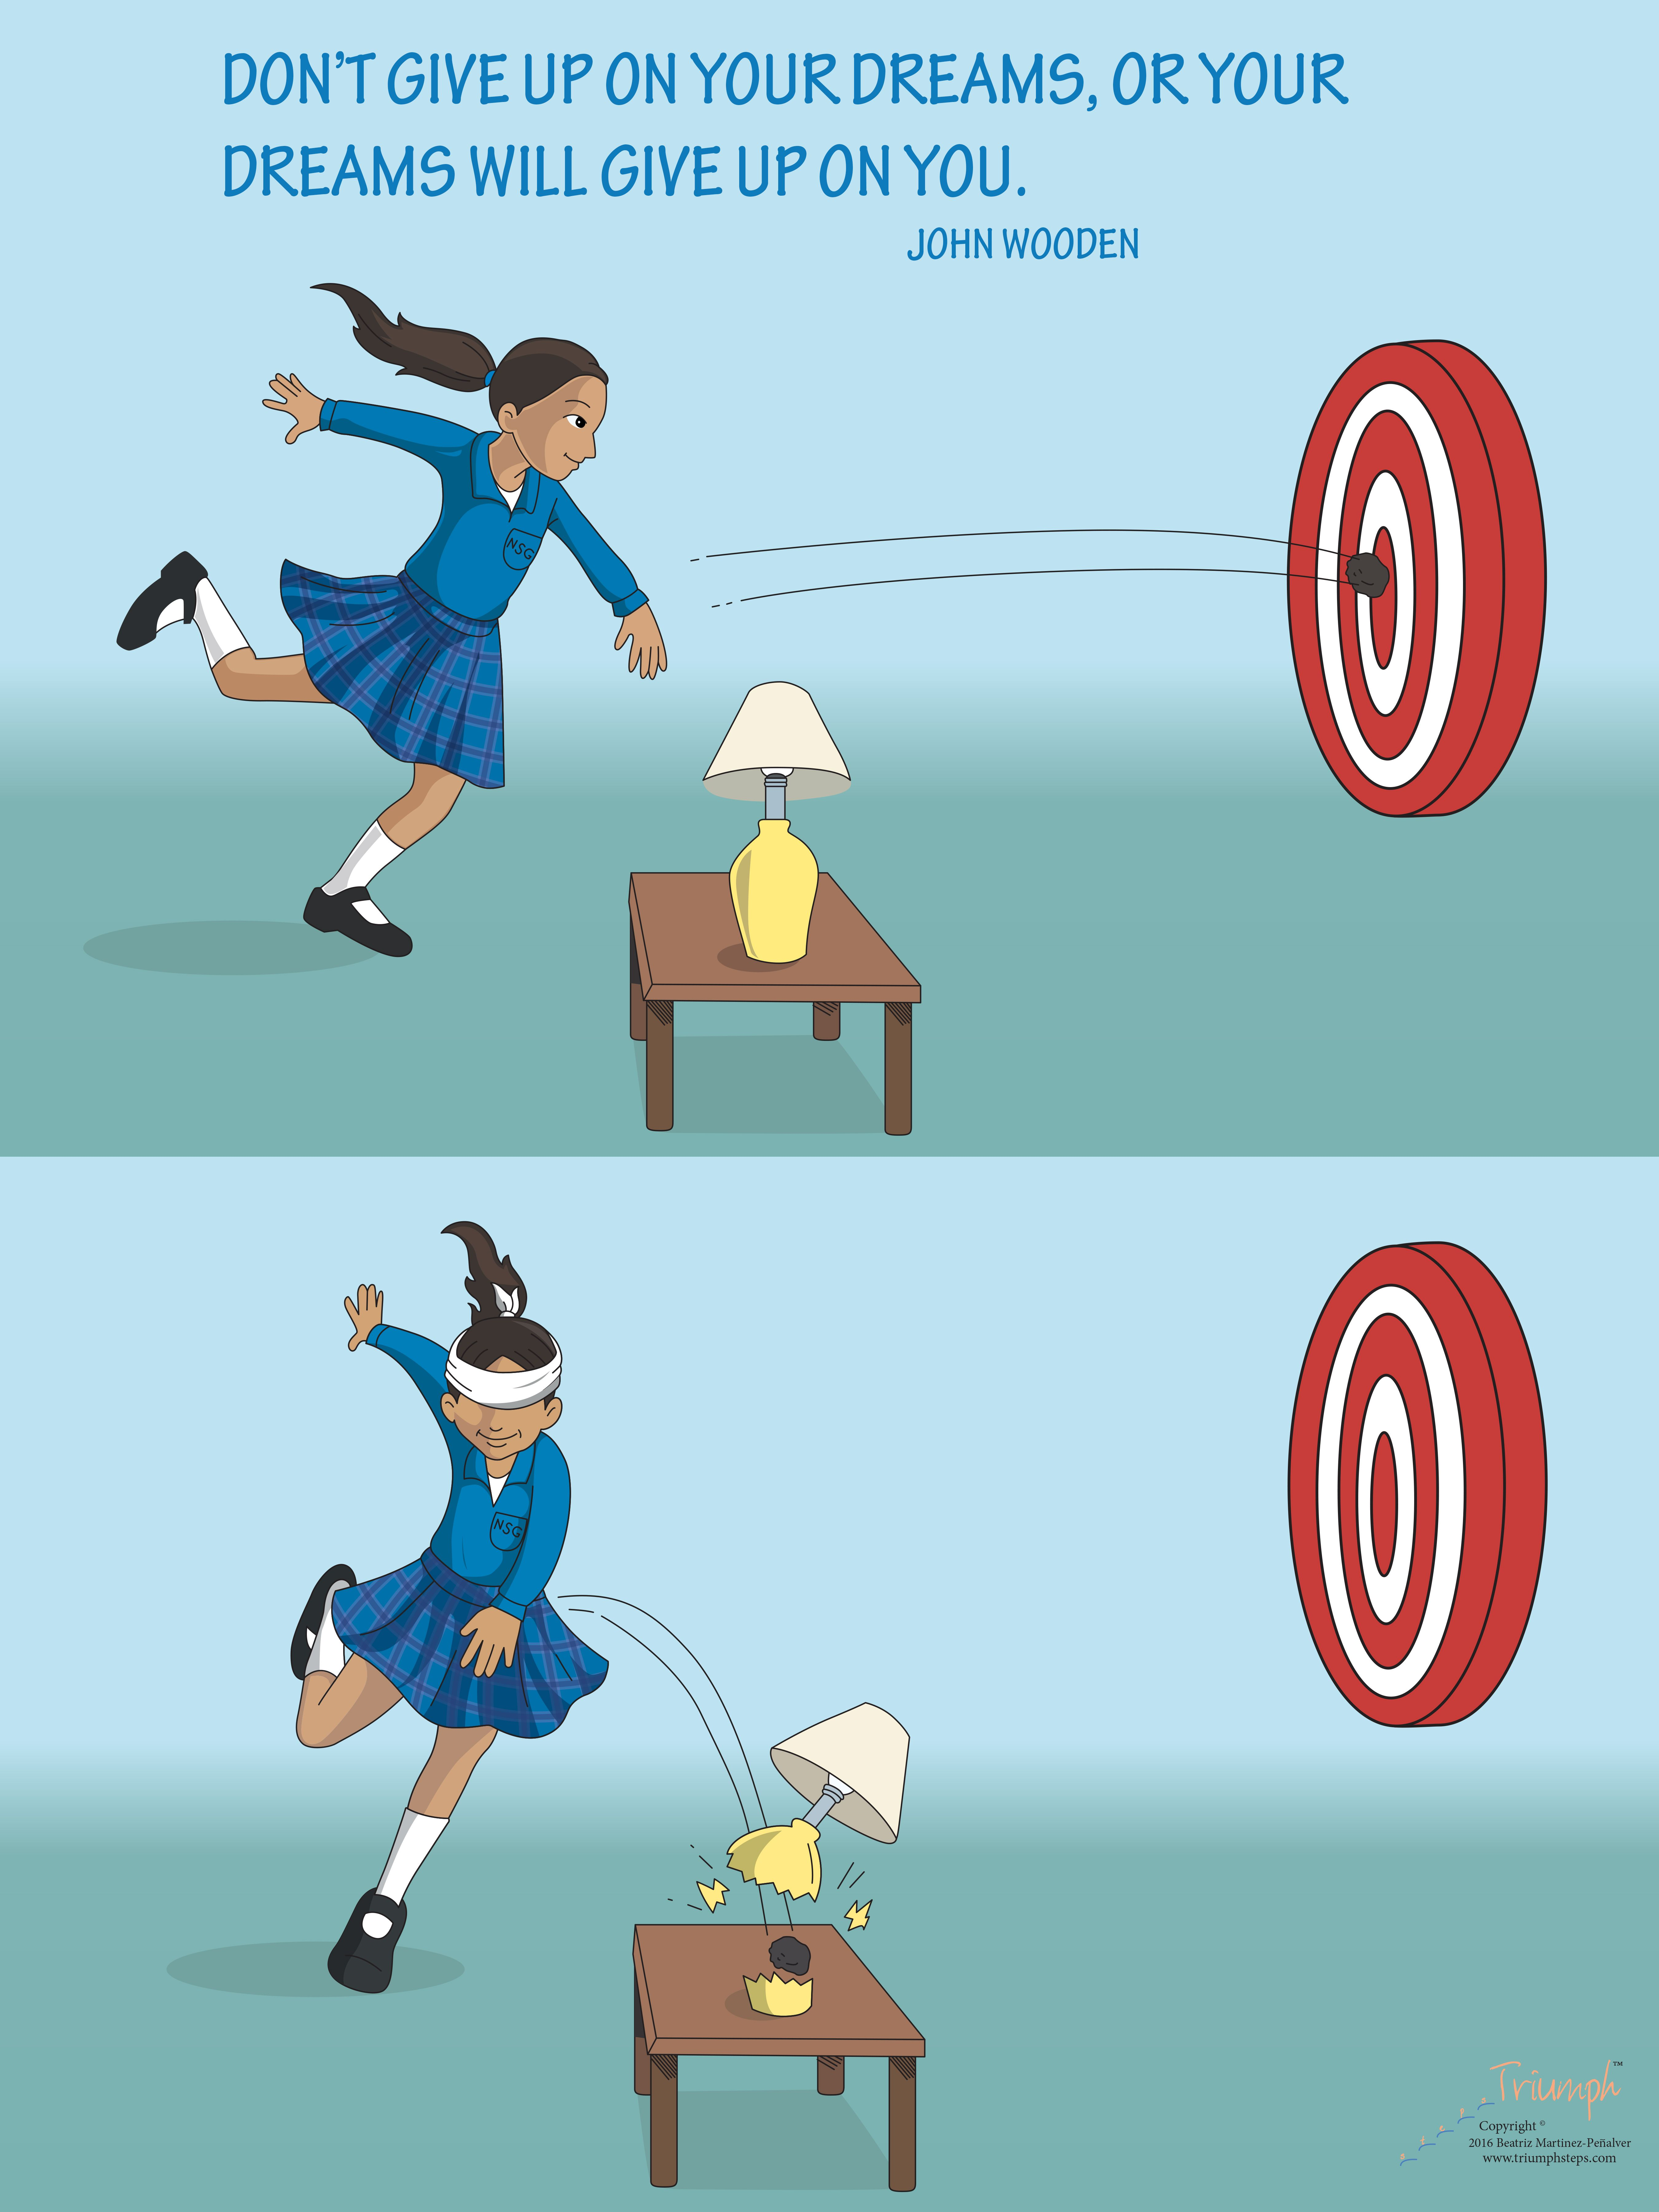 Teaching Children How To Avoid Developing Erroneous